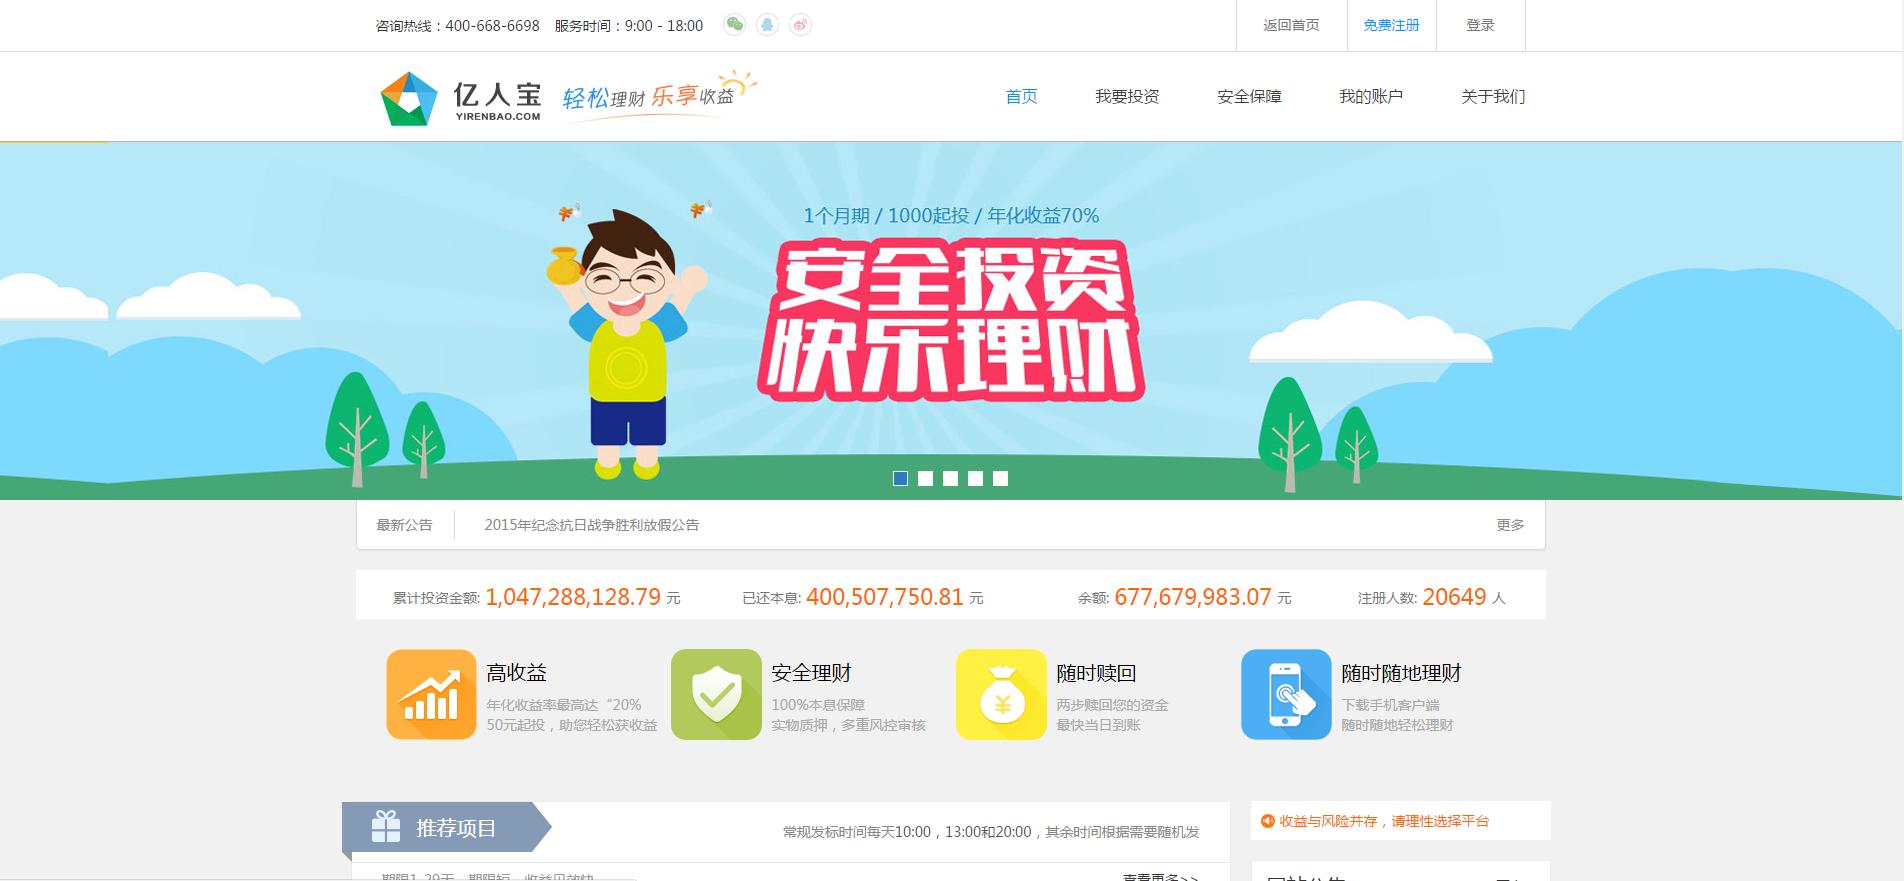 P2P网贷平台全套网站模板下载